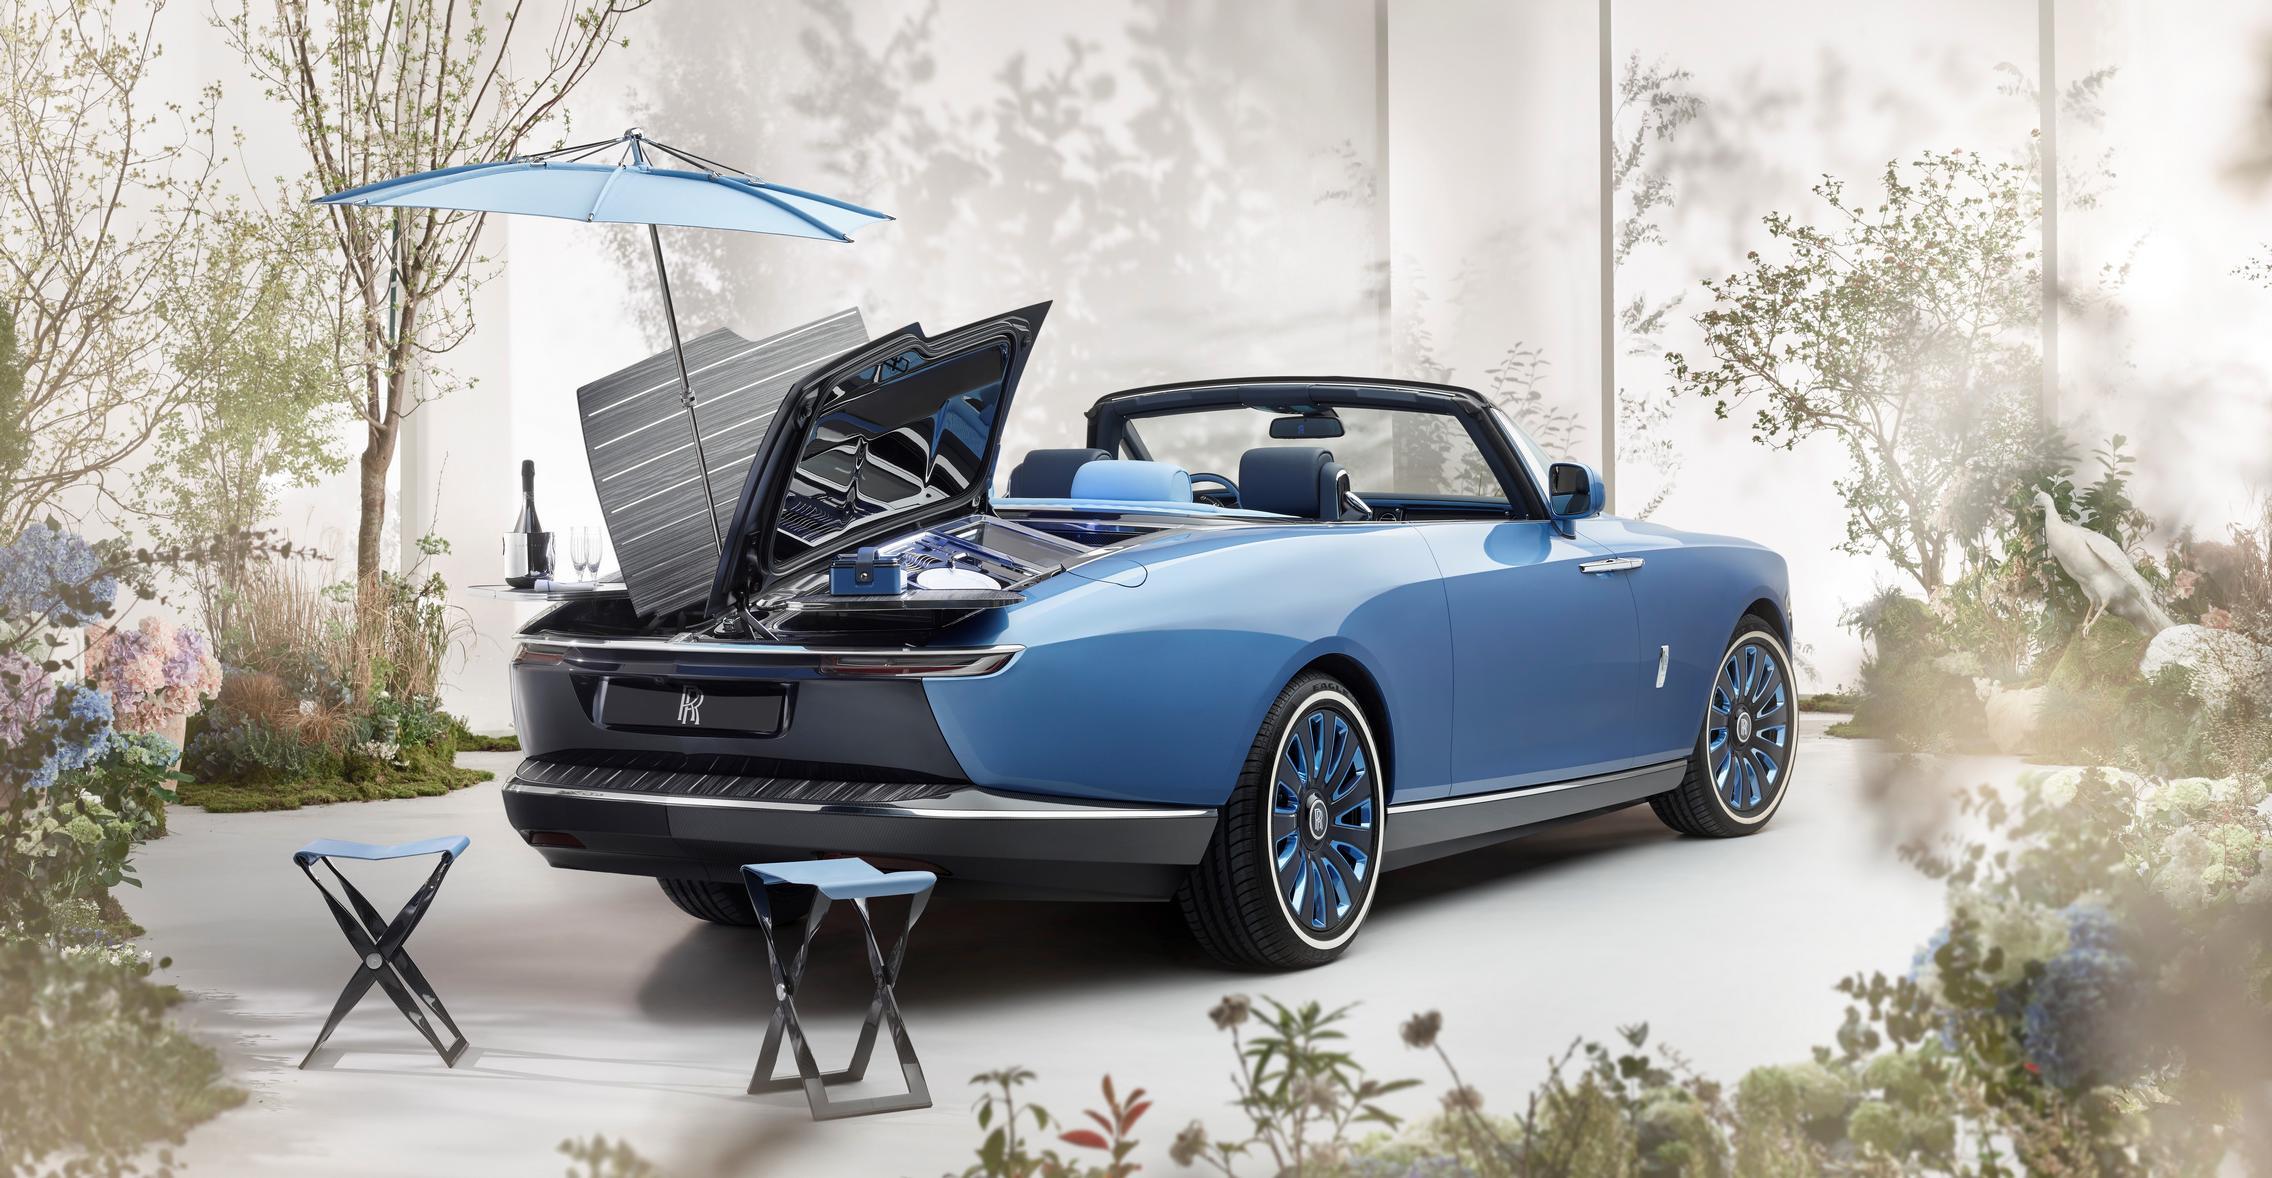 Rolls-Royce Boat Tail picnic